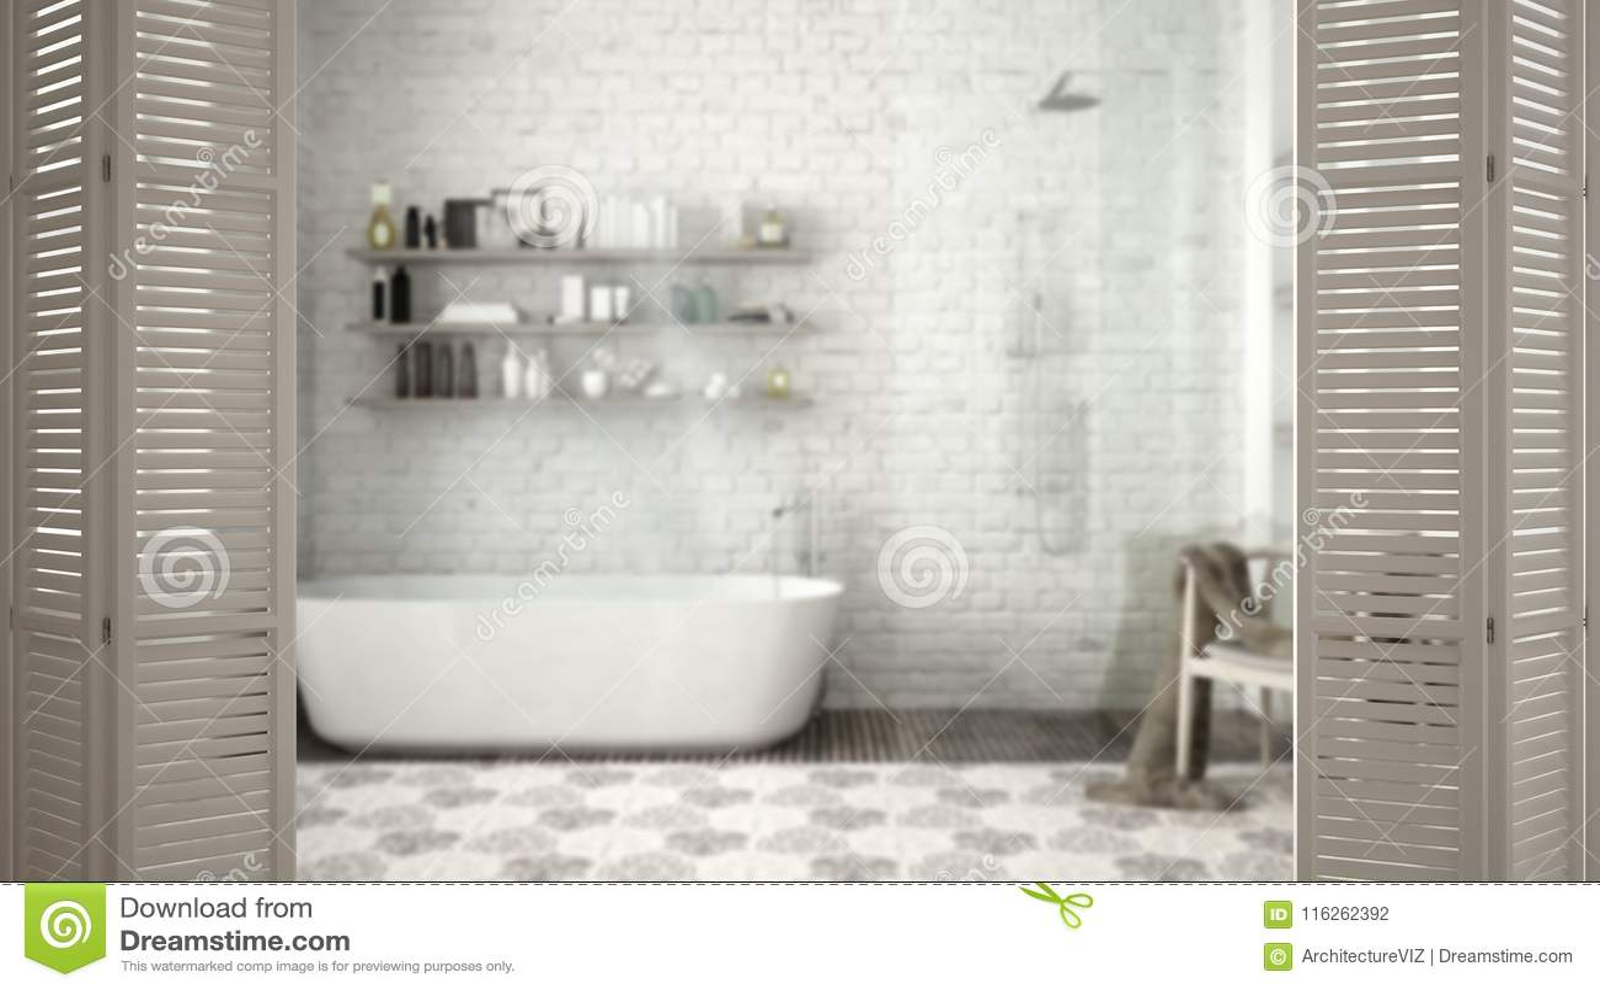 White Folding Door Opening On Modern Classic Bathroom With Bathtub